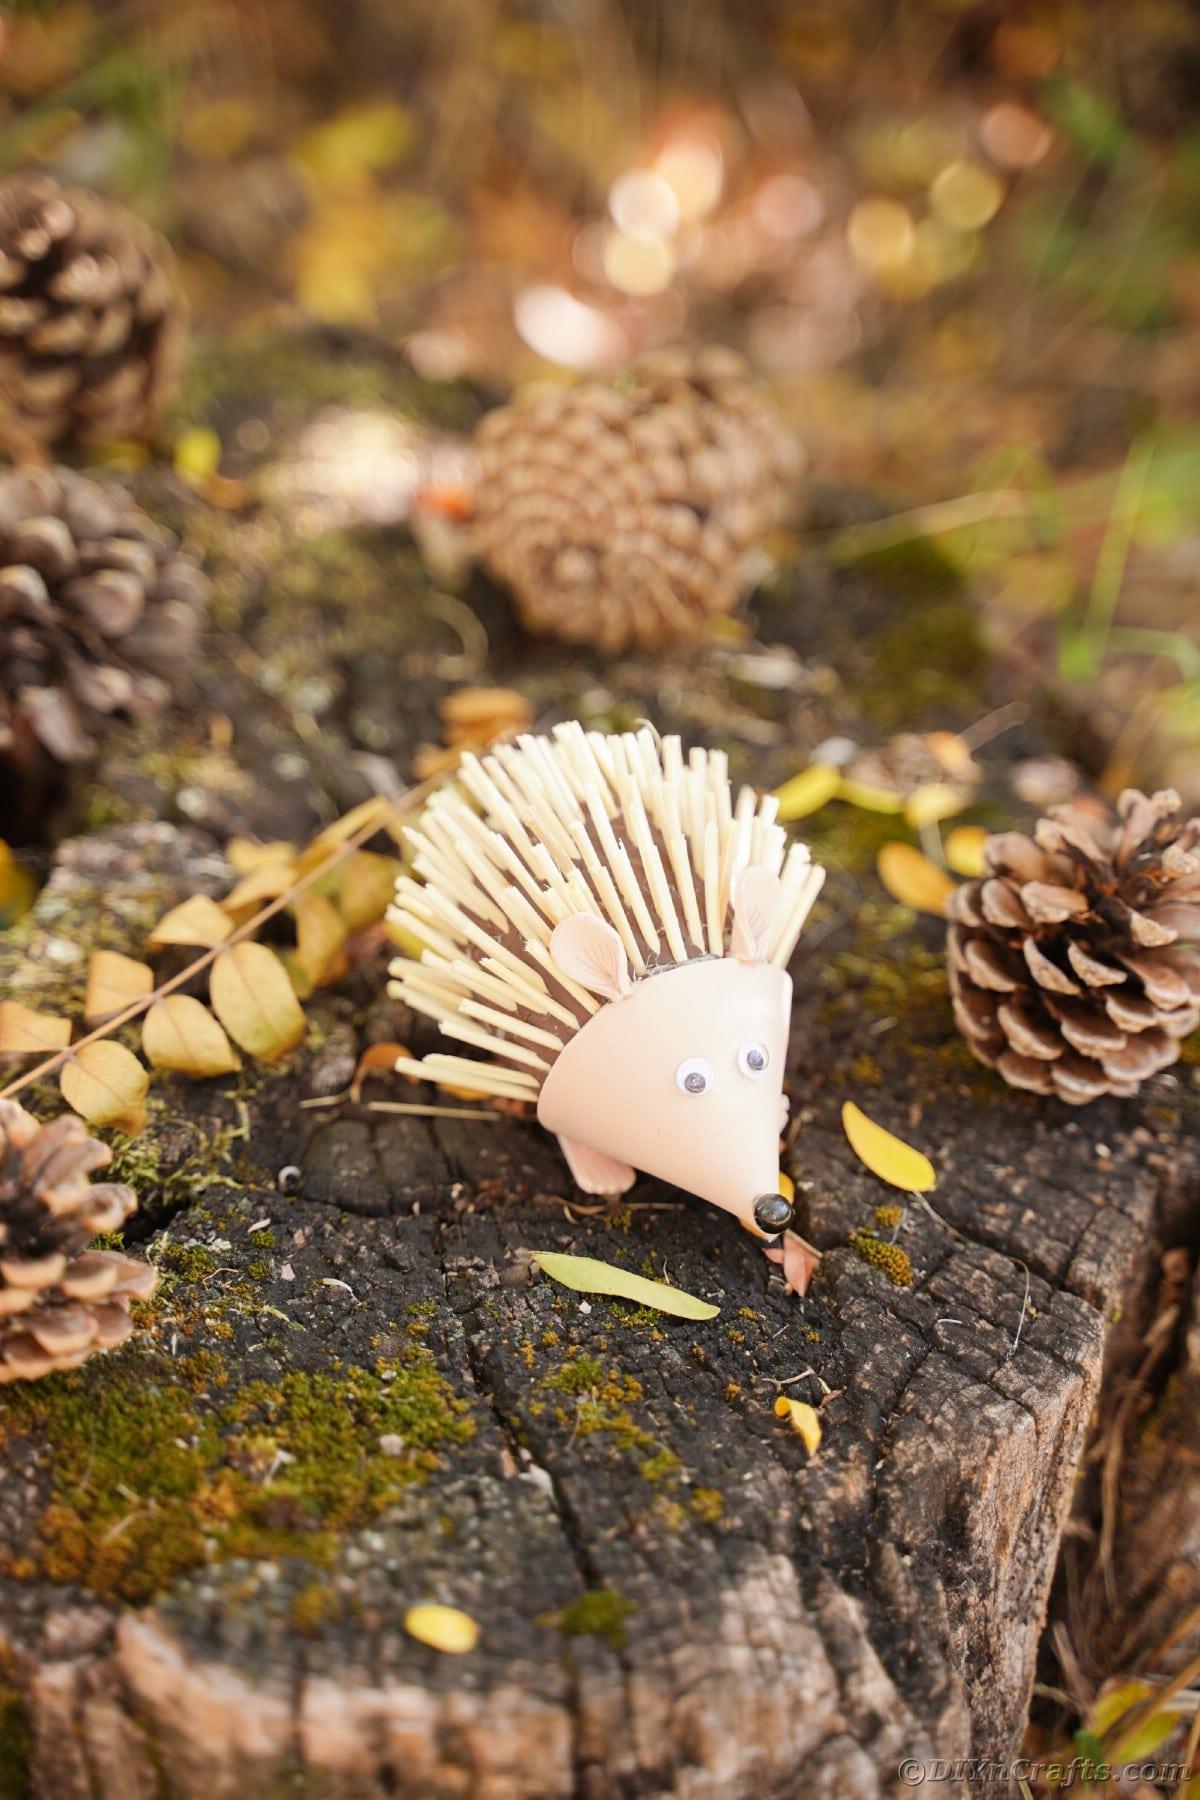 Foam hedgehog sitting on stump with pinecones